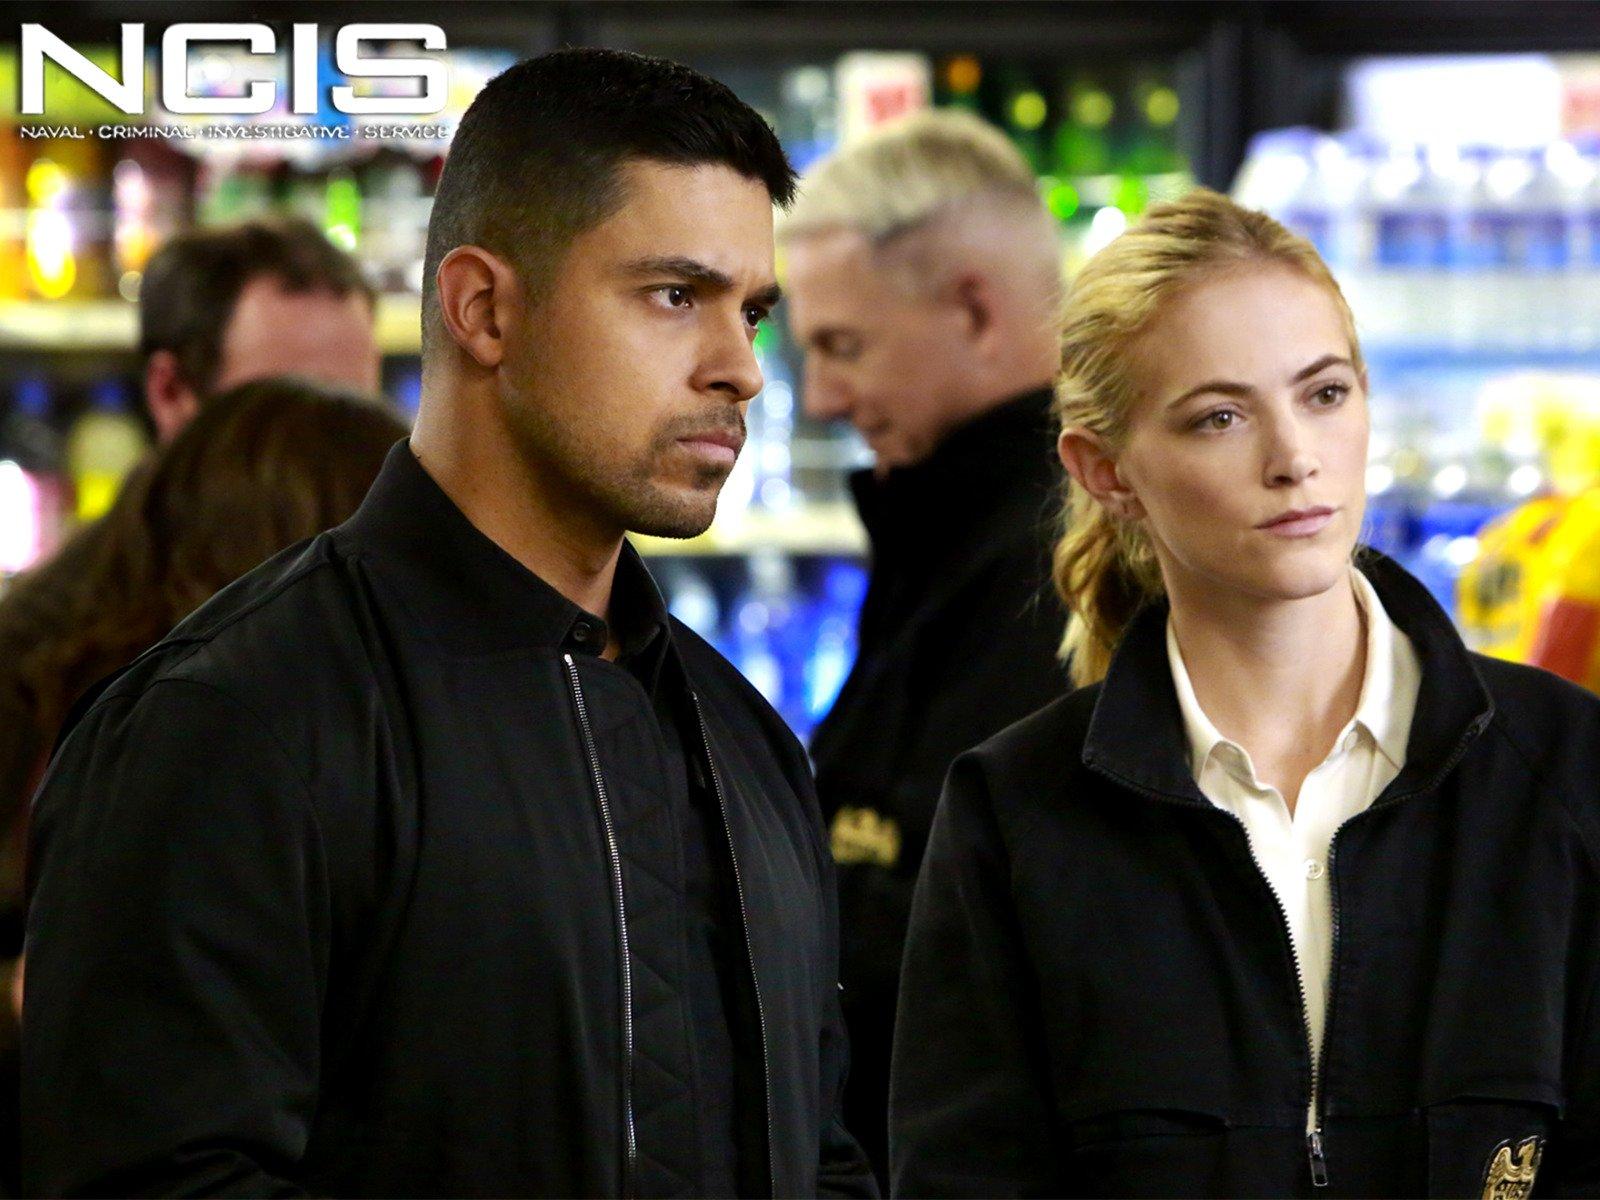 Amazon com: Watch NCIS, Season 14 | Prime Video